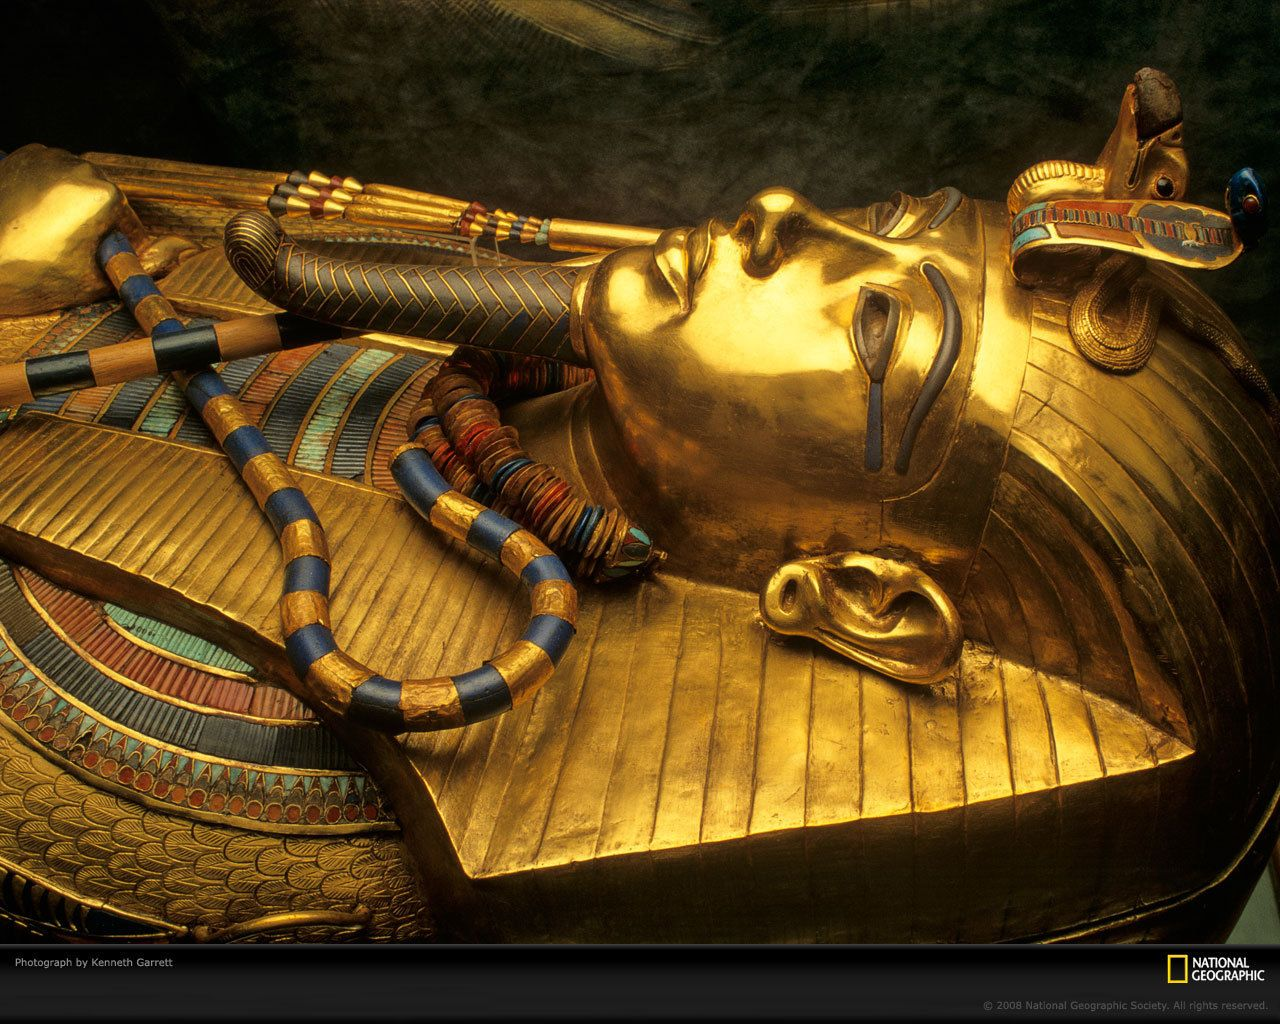 King Tut Sarcophagus King Tut Sarcophagus